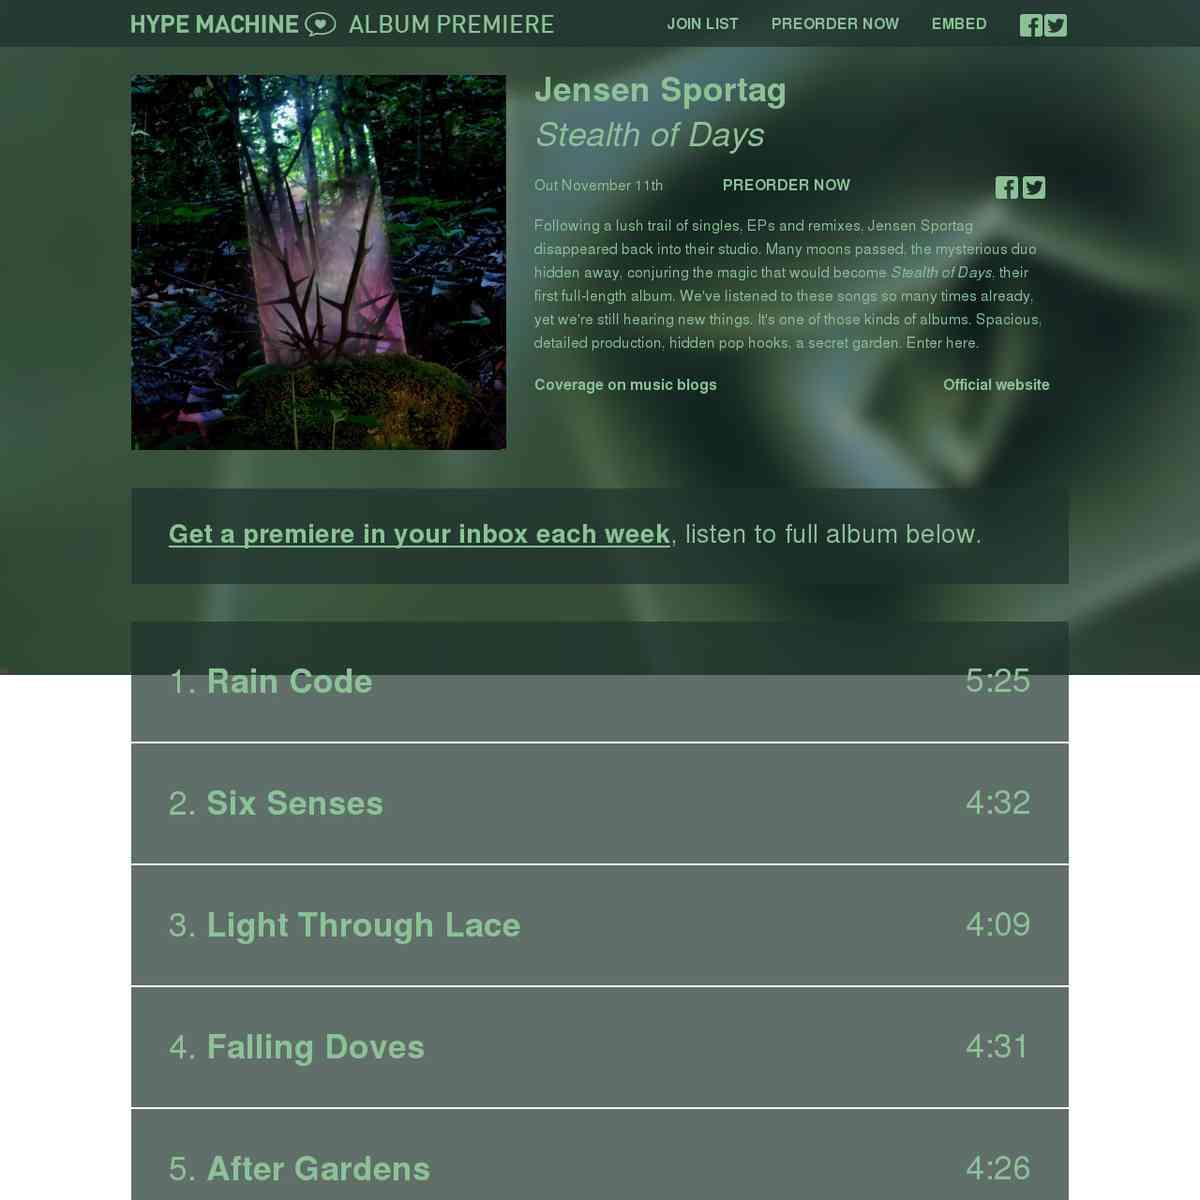 Jensen Sportag - Stealth of Days: Exclusive Album Premiere on Hype Machine